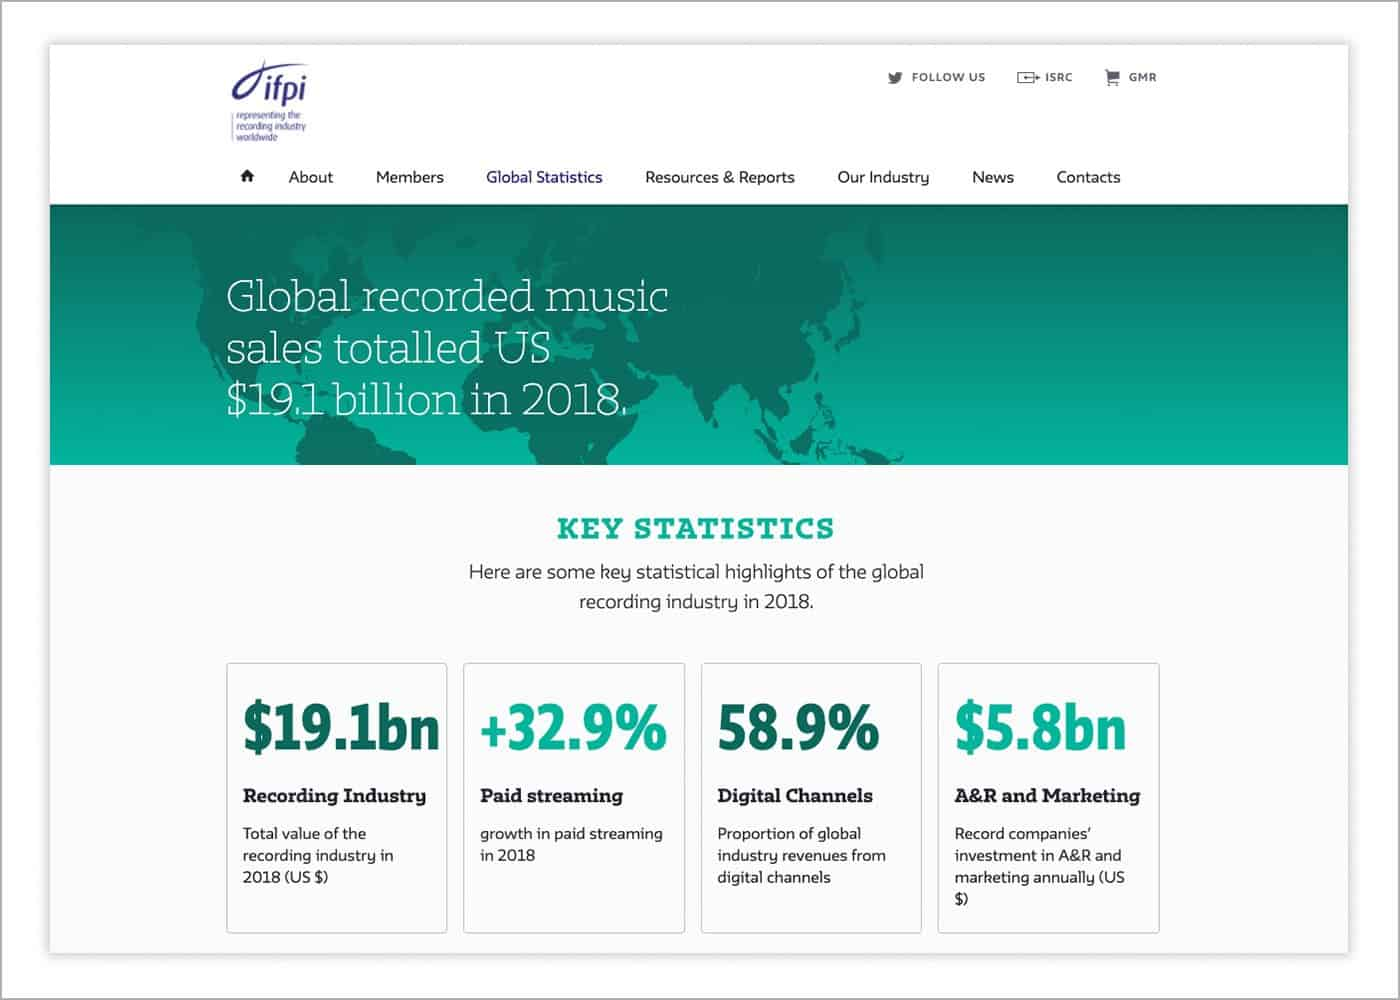 IFPI data